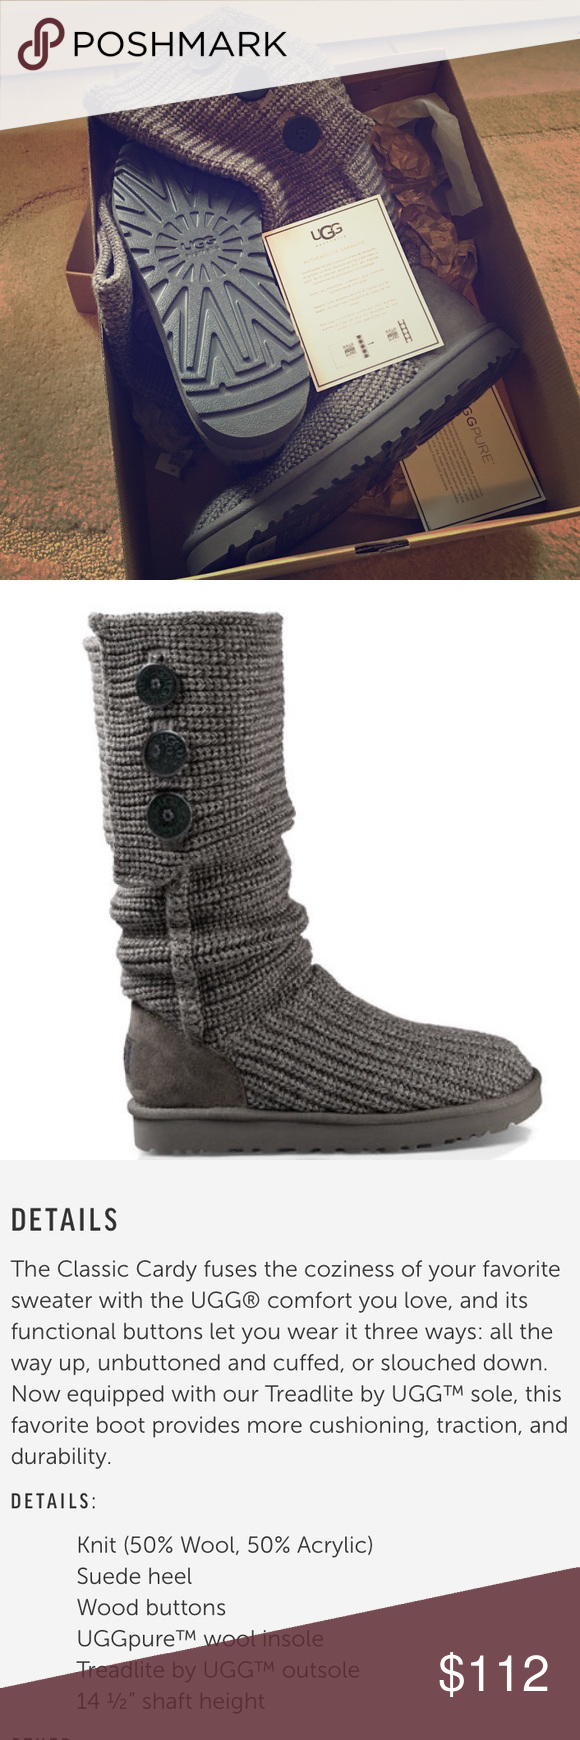 63de5707bea australia ugg cardy boots size 10 7e161 8a7a1